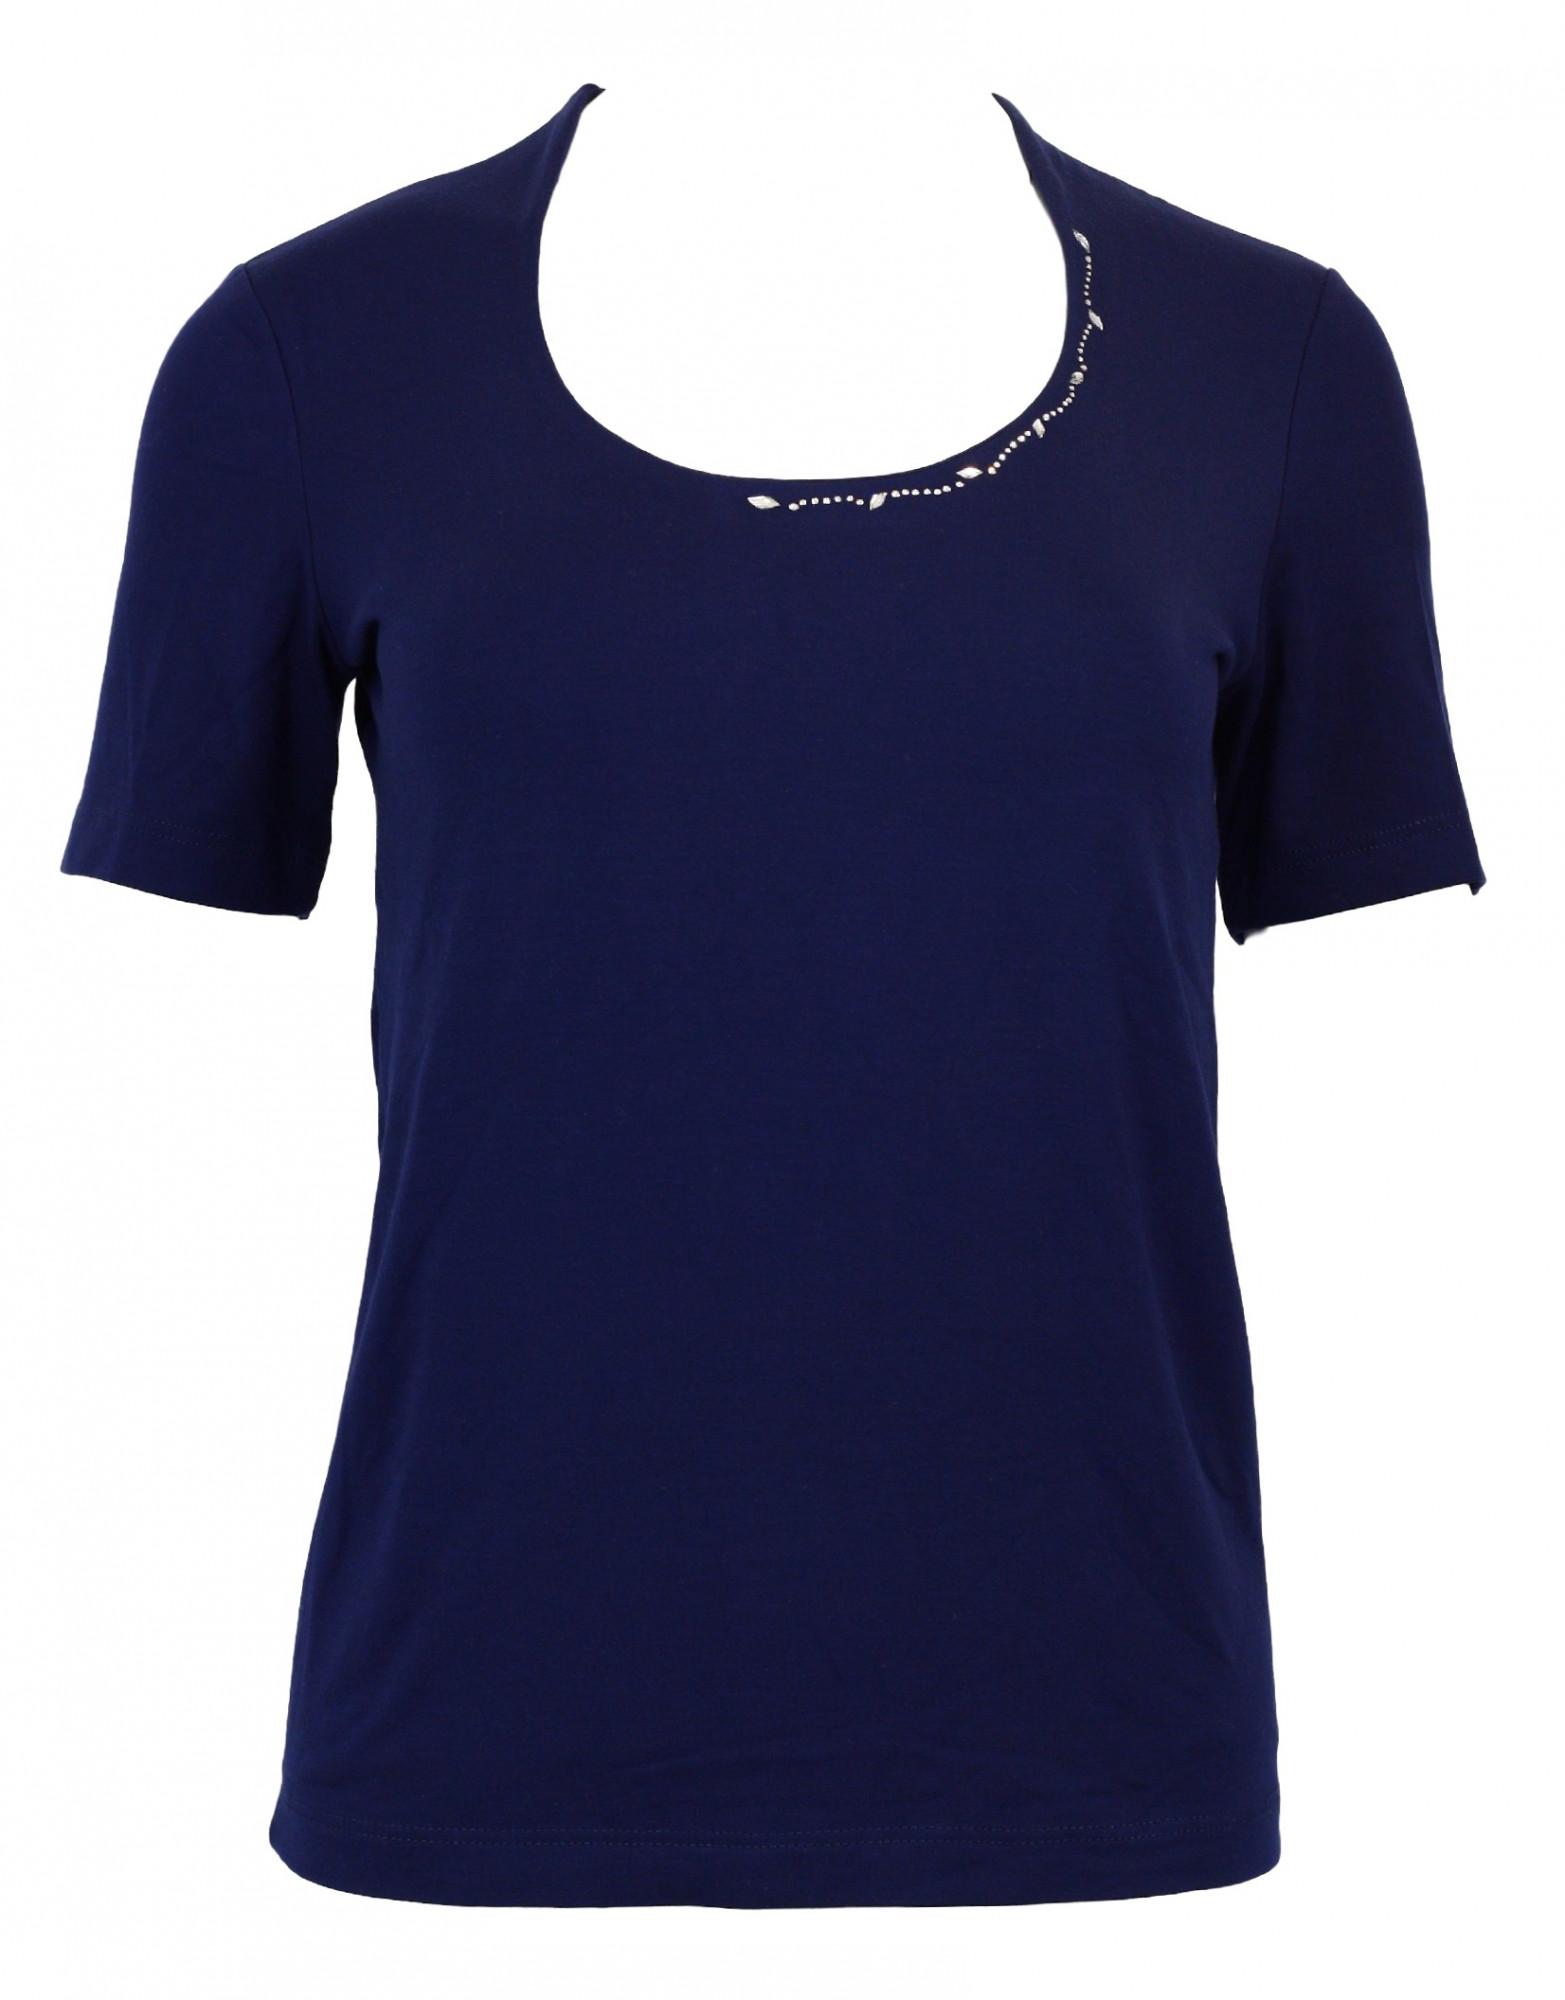 Dámské tričko Liw KR - Favab Barva: modrá, Velikost: M